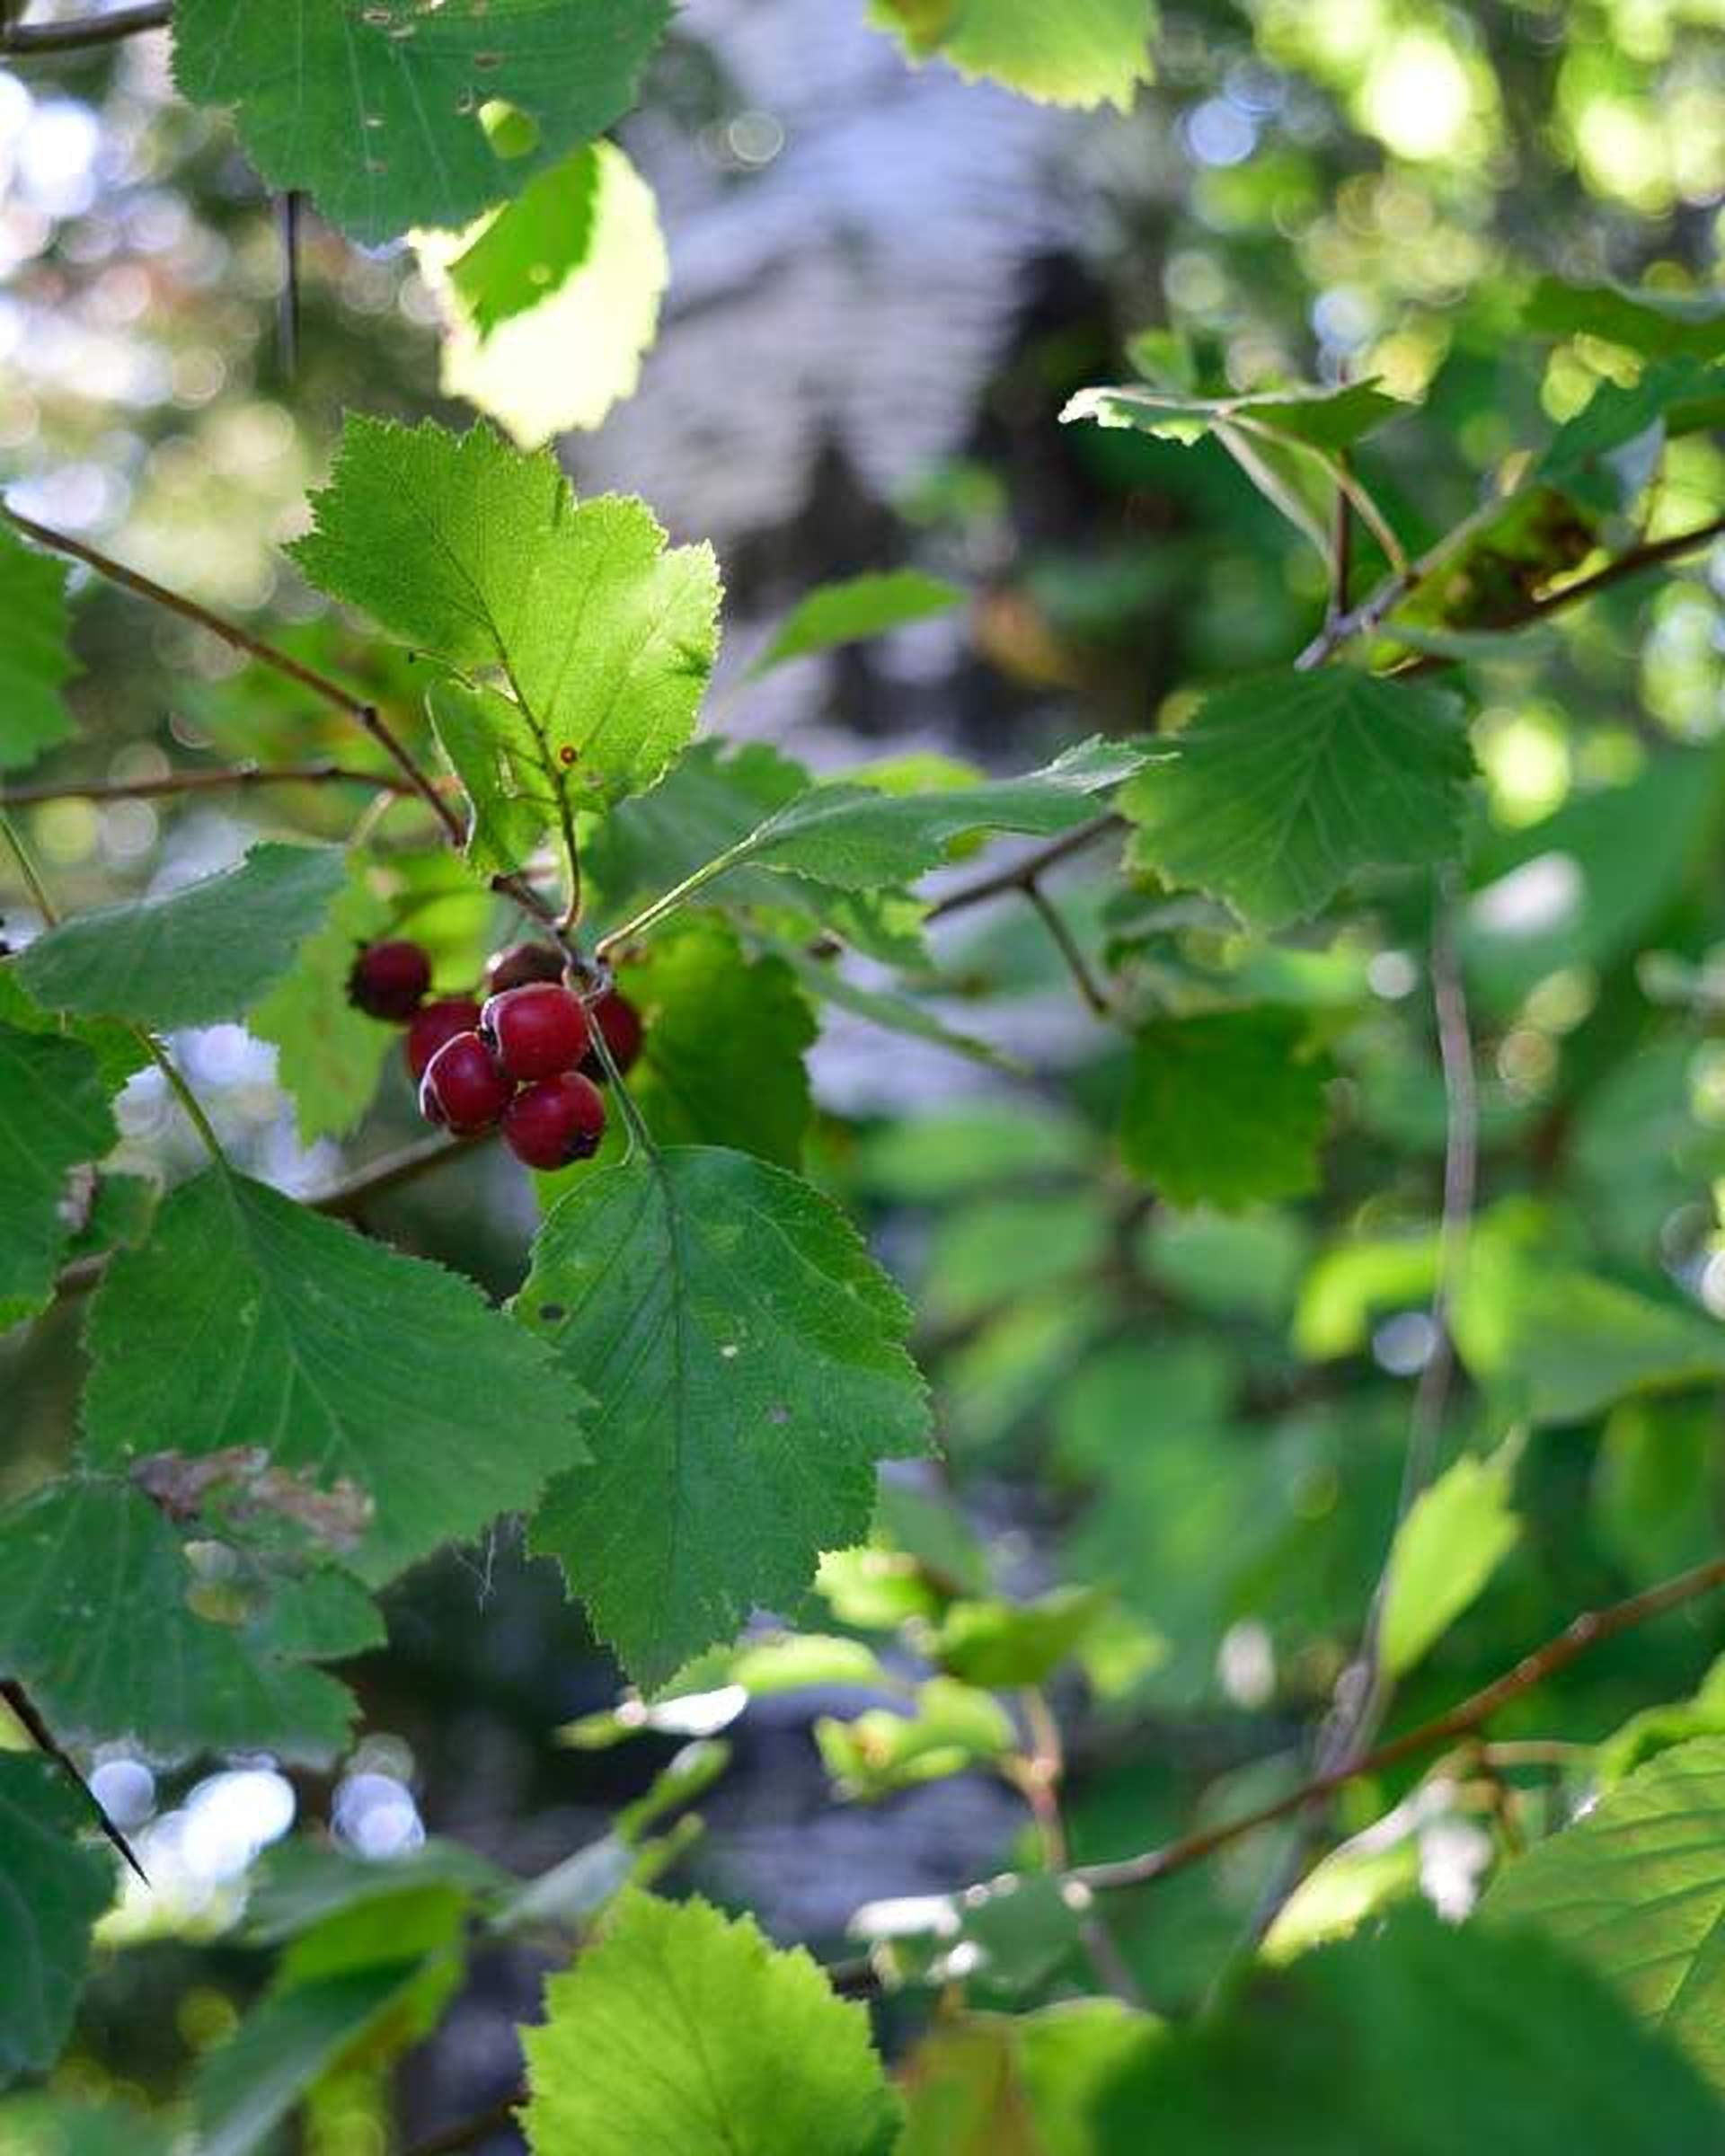 Mayhaw Fruit Tree Crataegus aestivalis Cannot Ship to CA, AZ, AK, HI, OR or WA PER State Laws